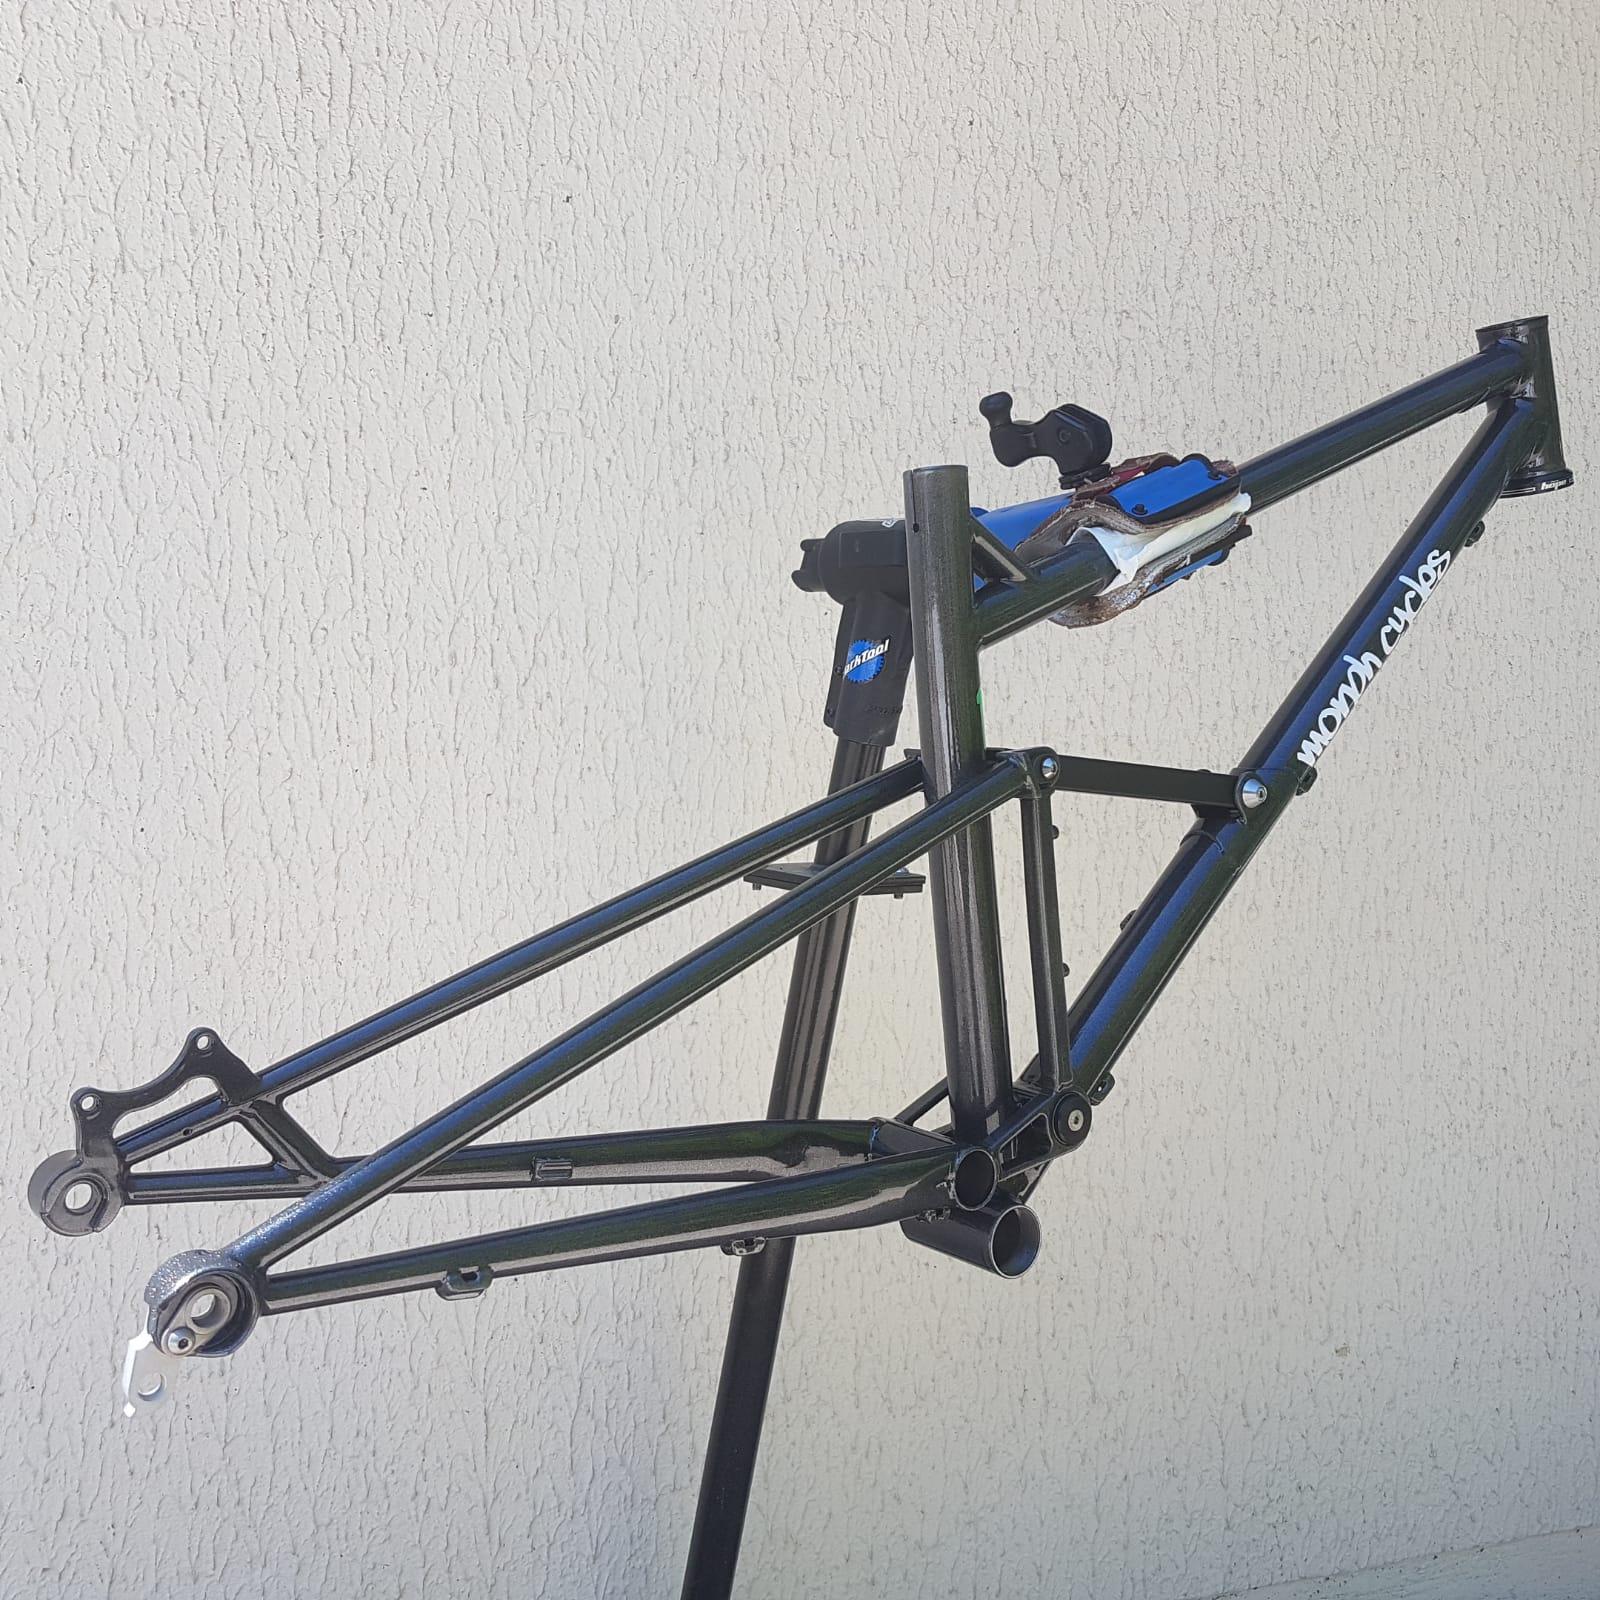 Baudou_bikes_tout_suspendu_iso_arr_fini